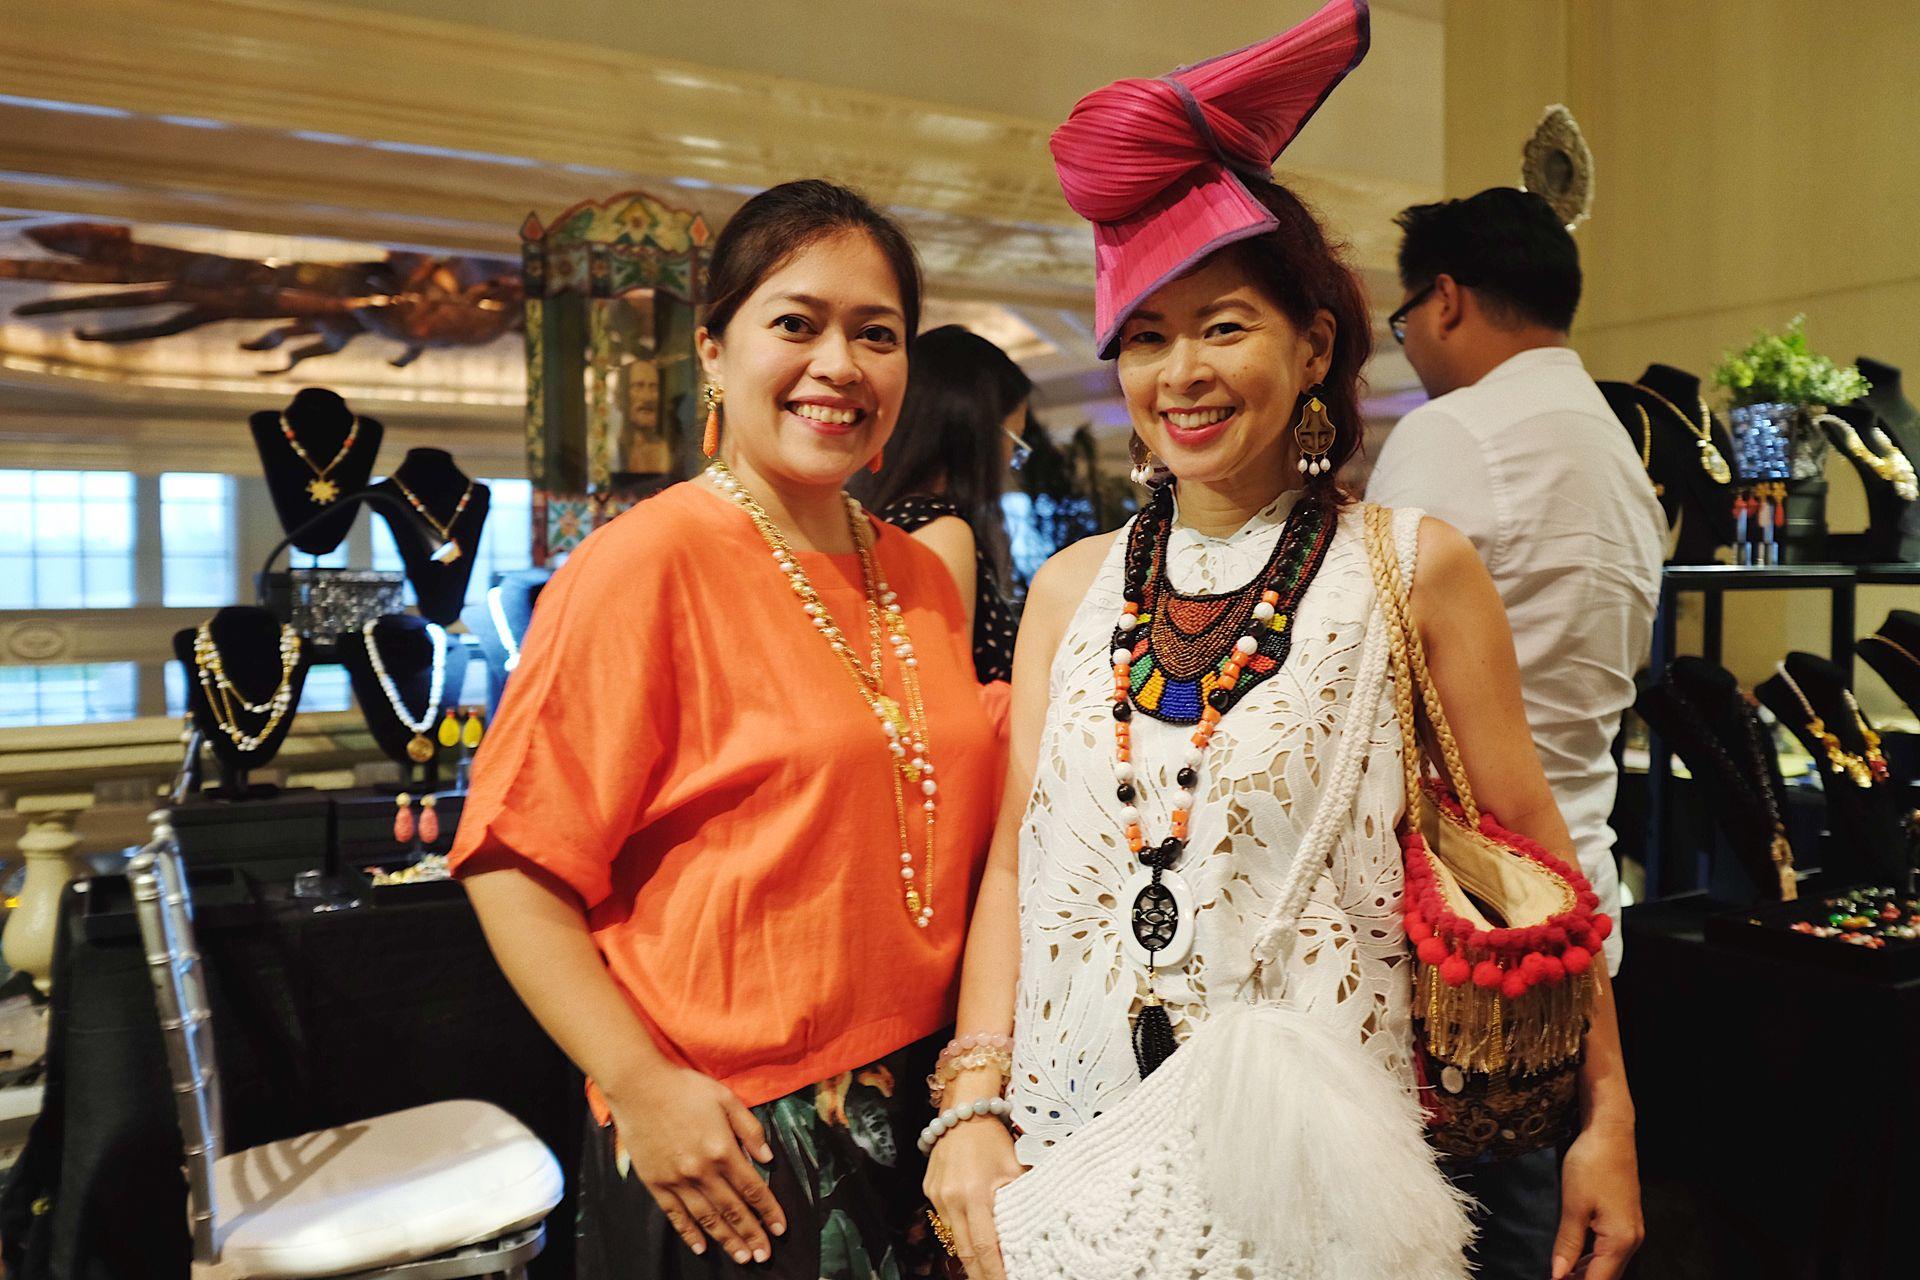 Tim Tam Ong with Tessa Prieto-Valdes